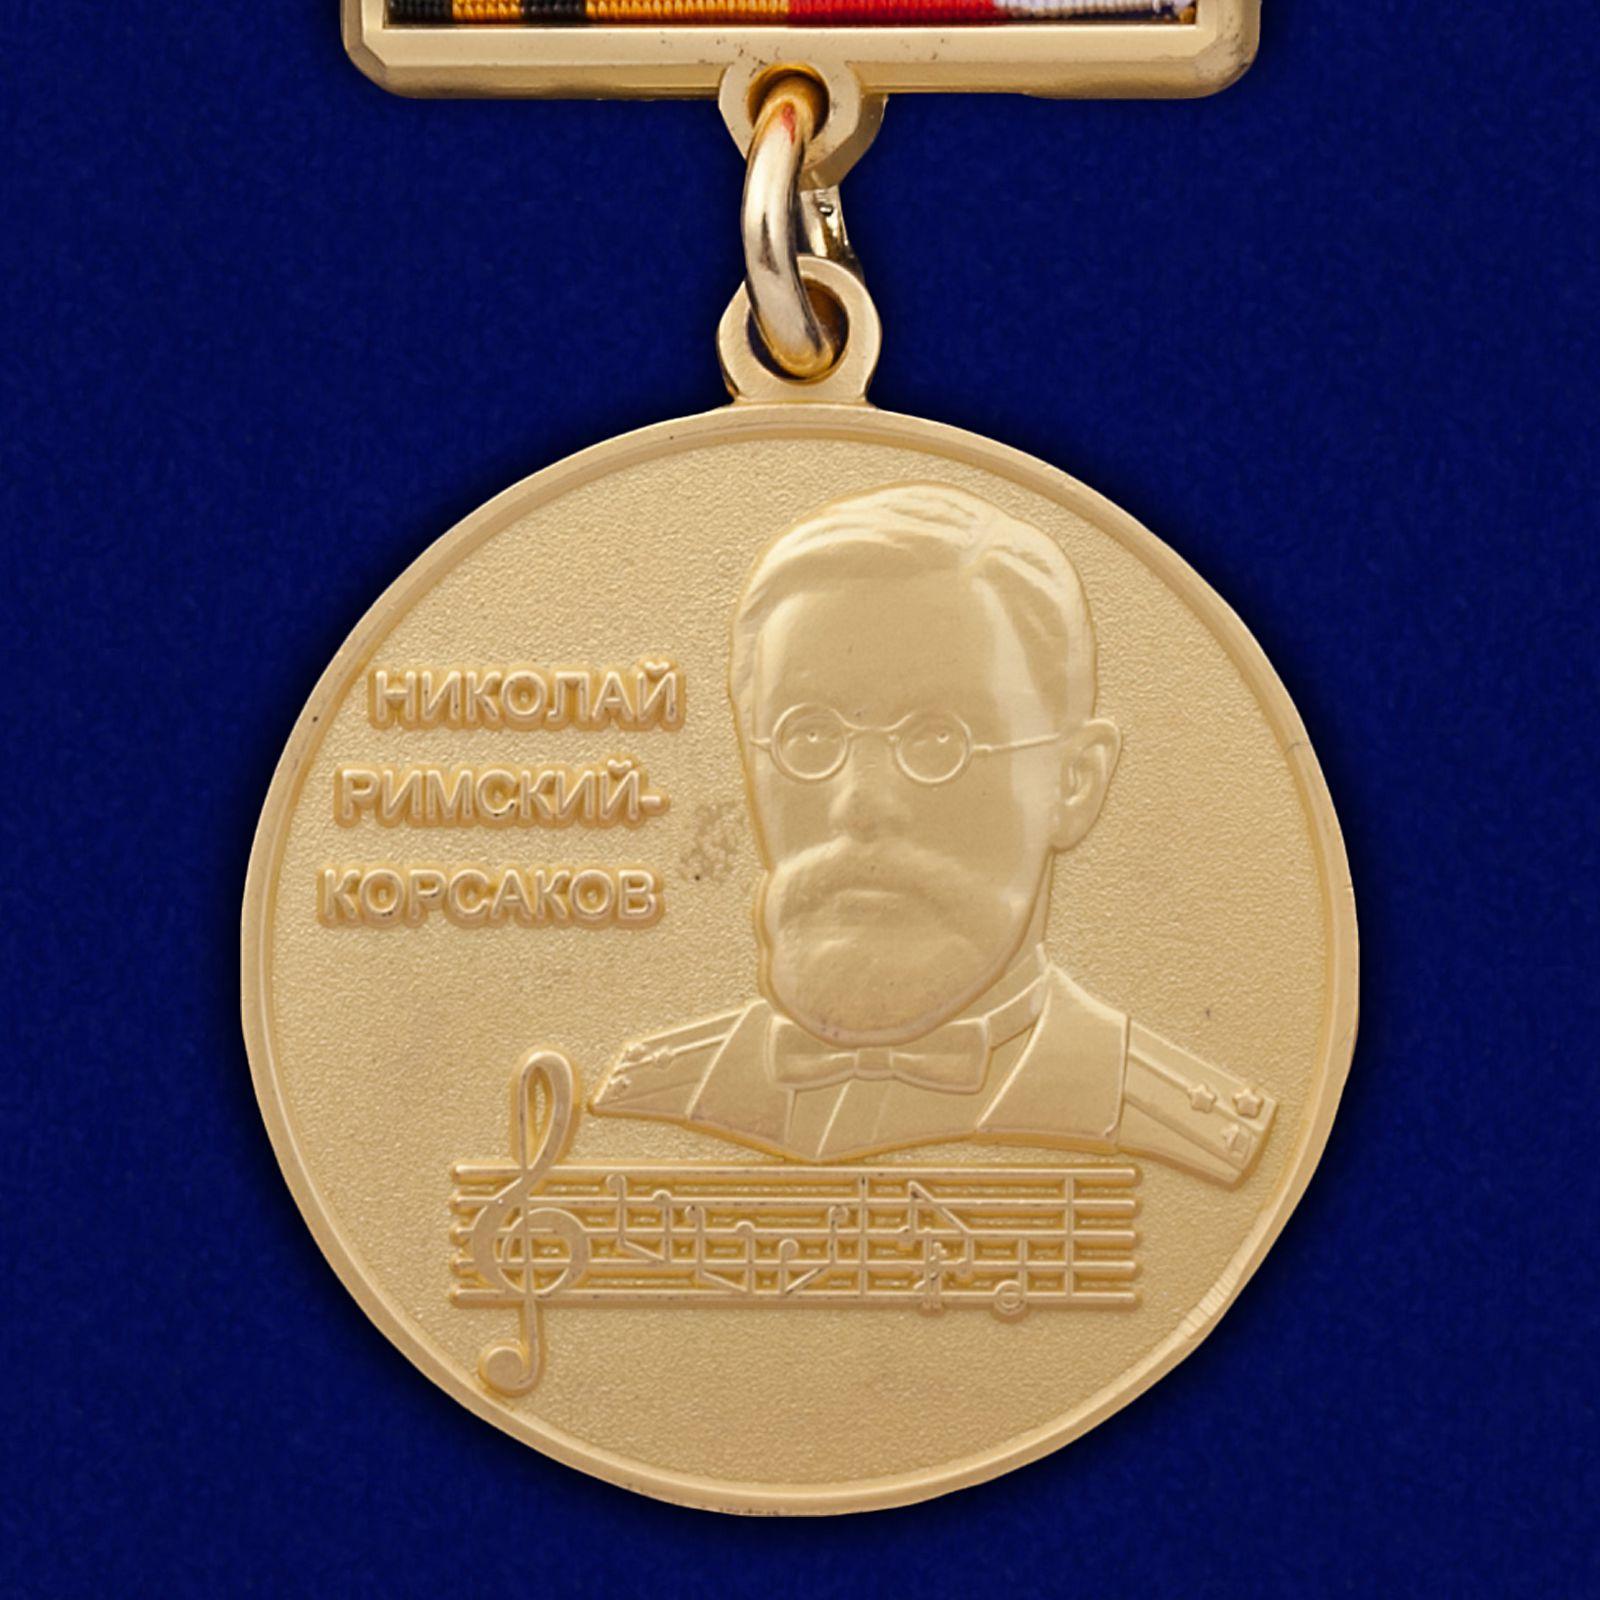 "Знак ""Николай Римский-Корсаков"" заказать"